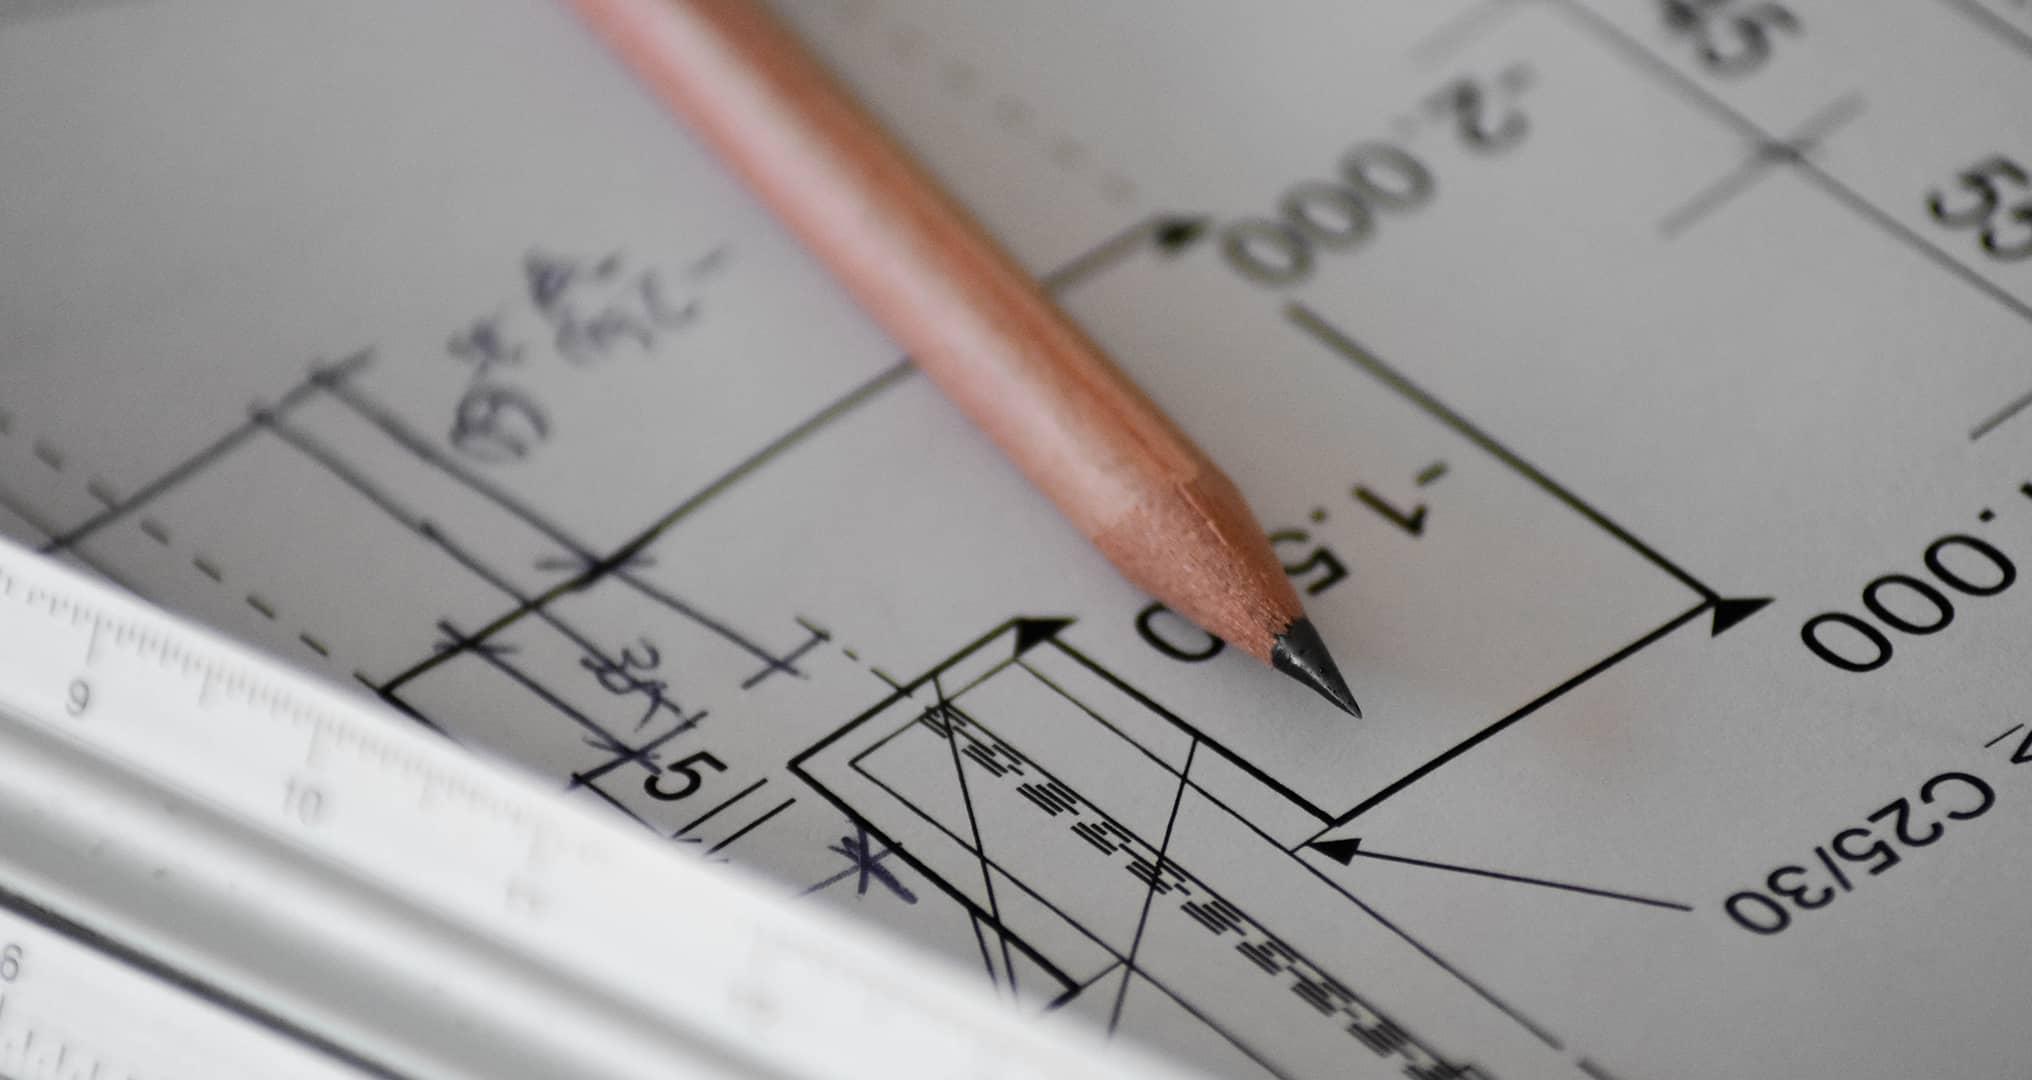 Blueprints for office design